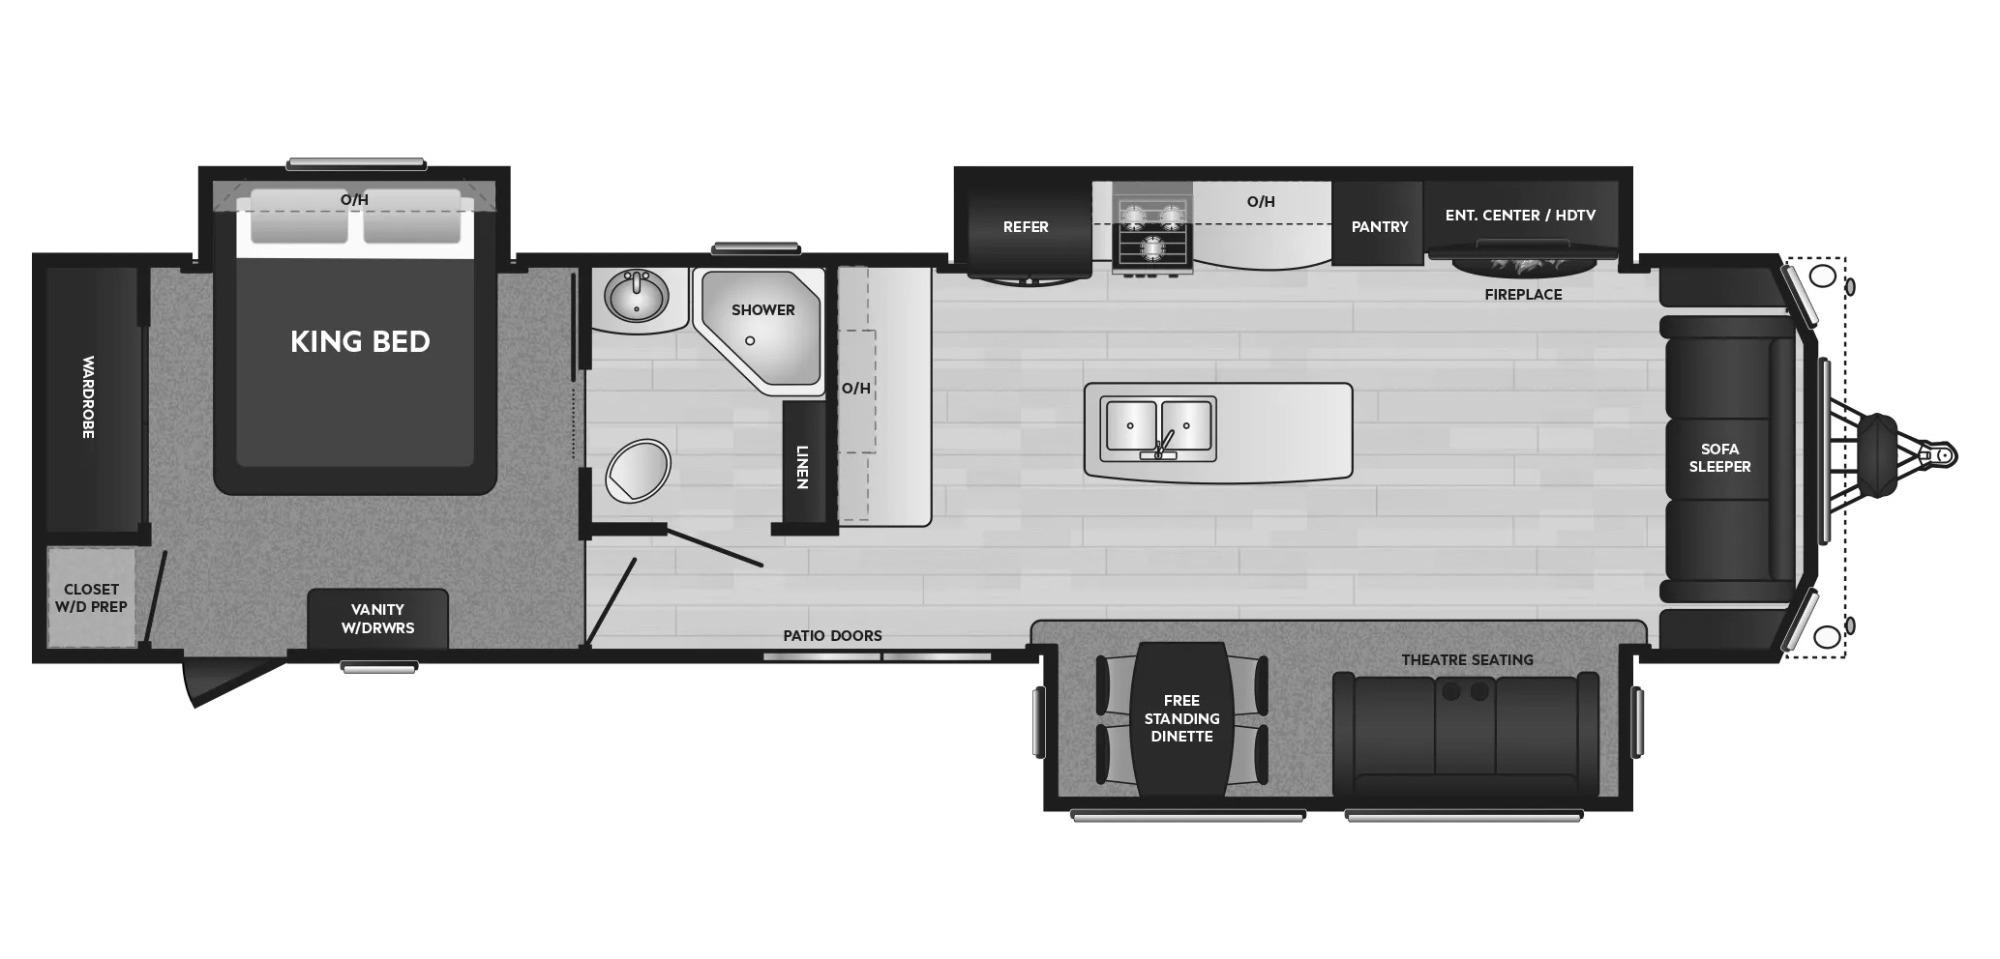 View Floor Plan for 2021 KEYSTONE RESIDENCE 40MKTS